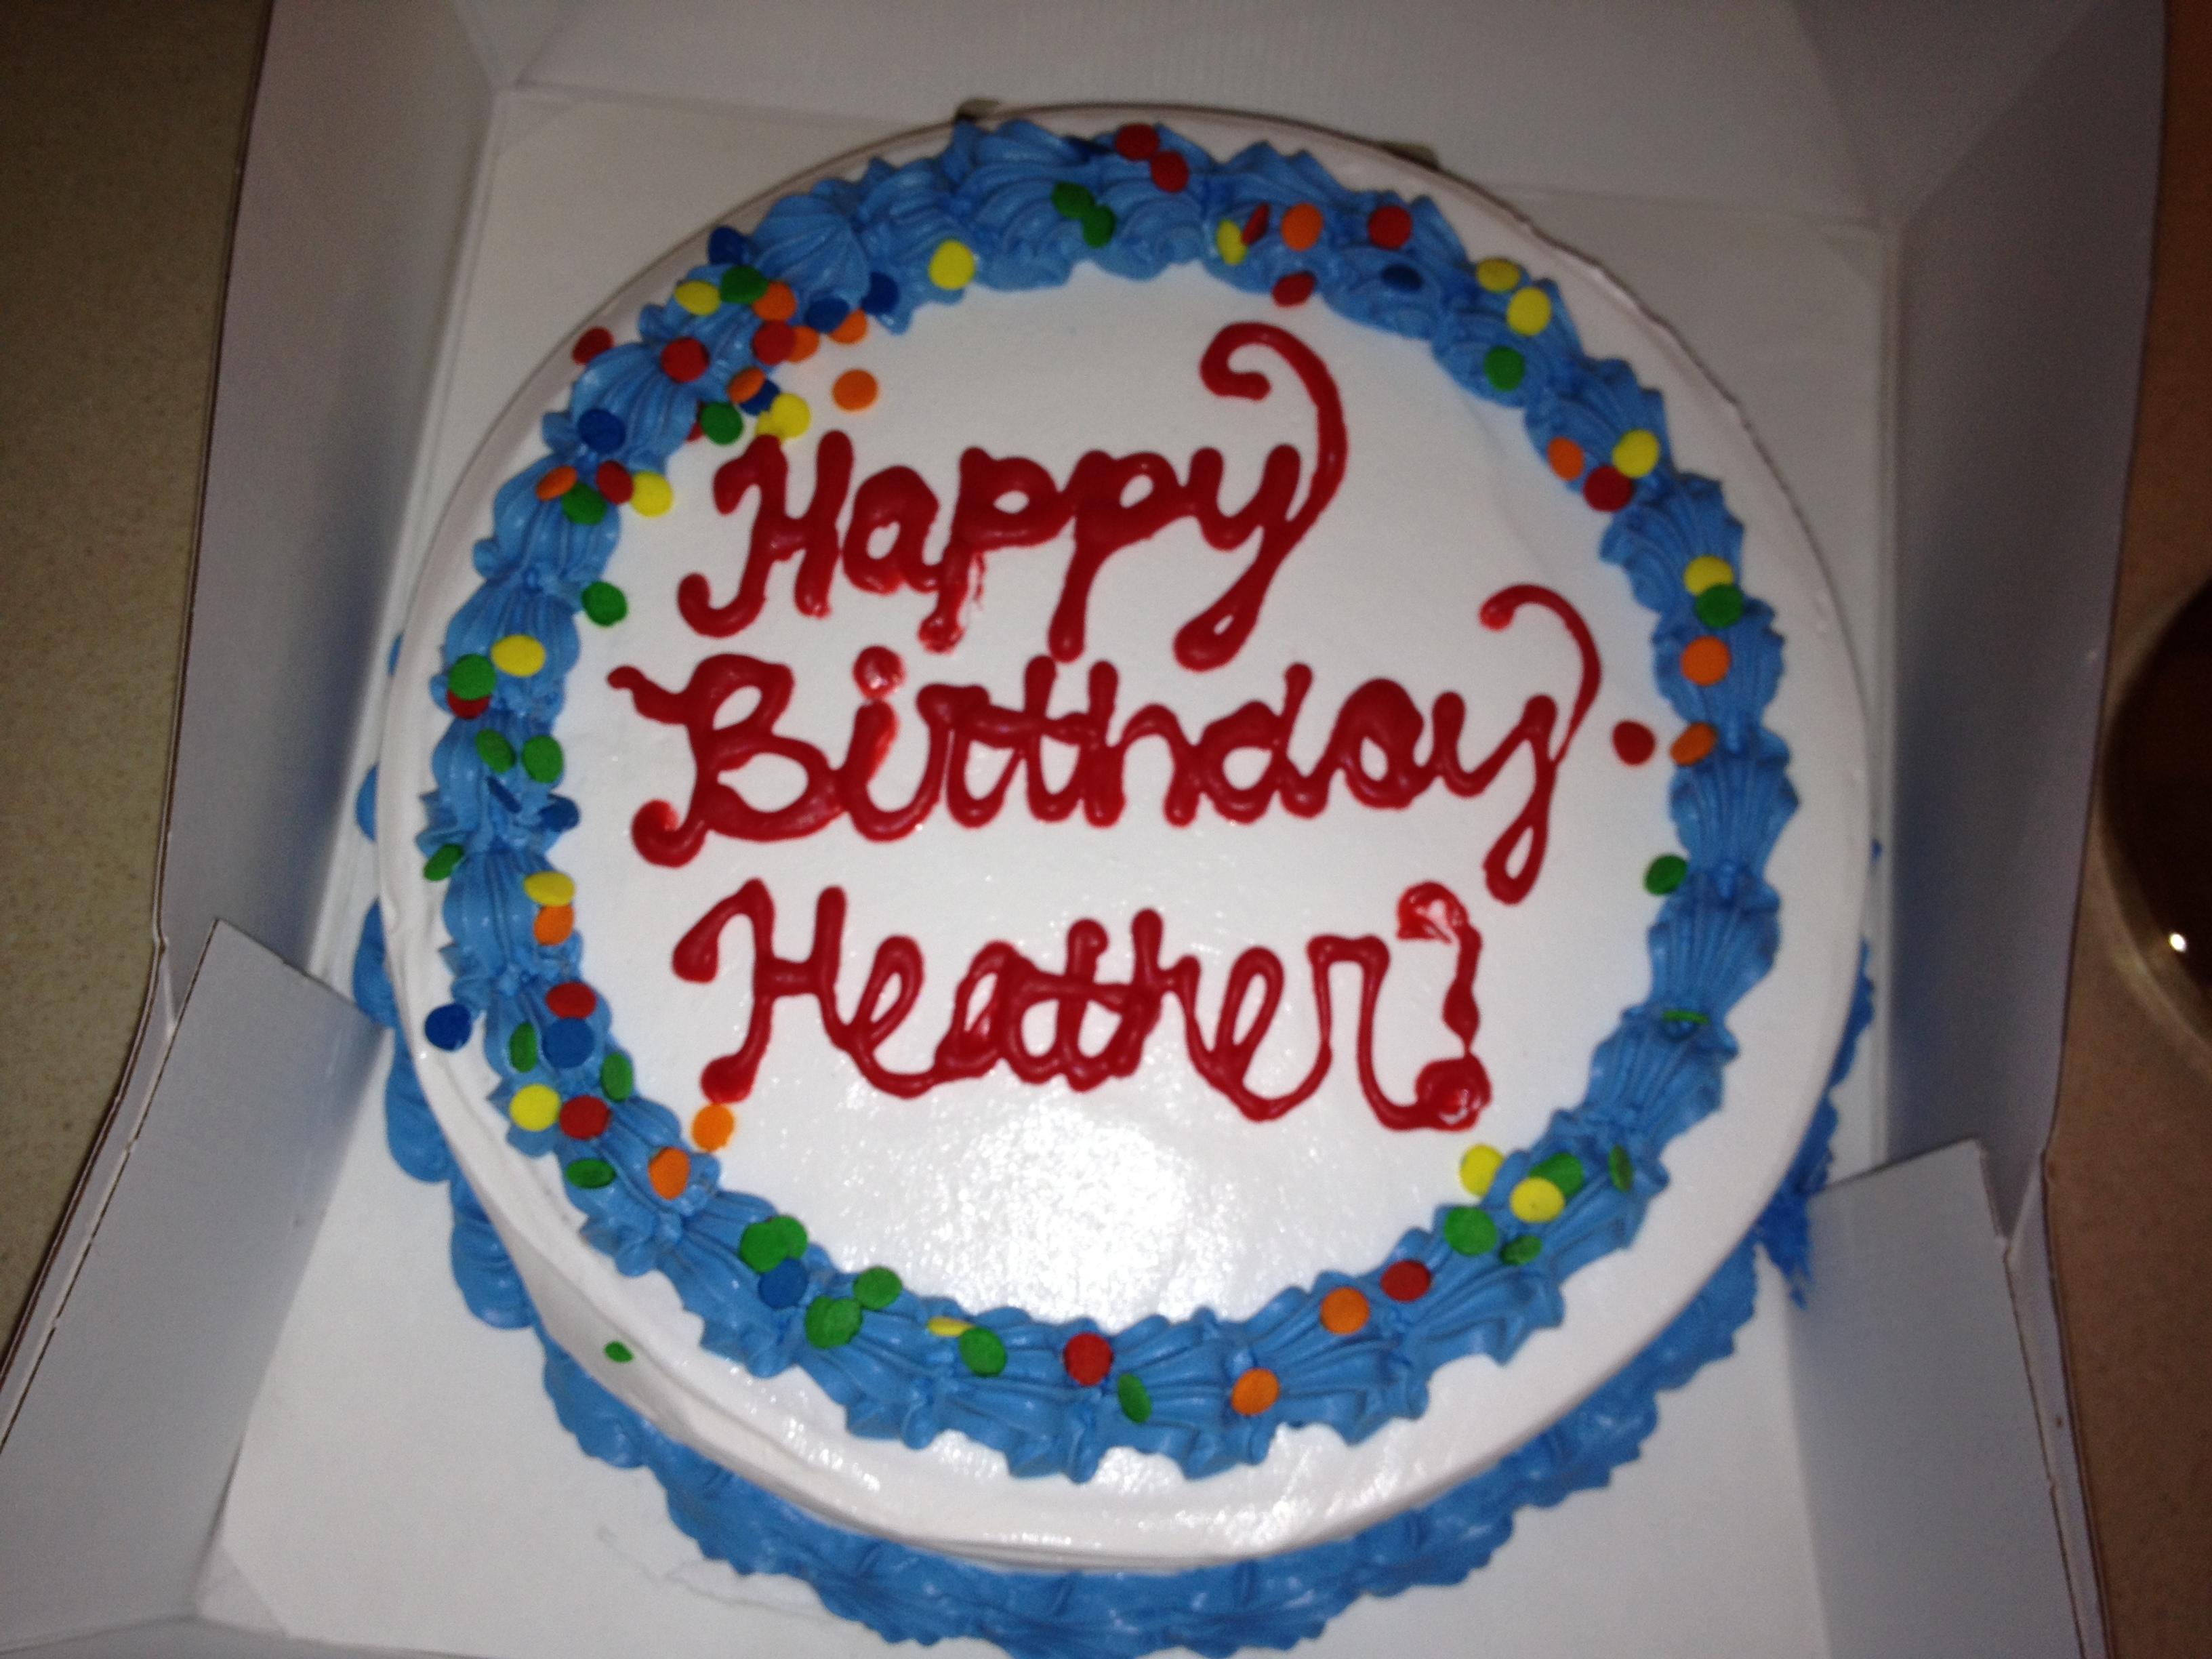 Happy Birthday To Me I Heart Ny Y All By Heather Flanigan